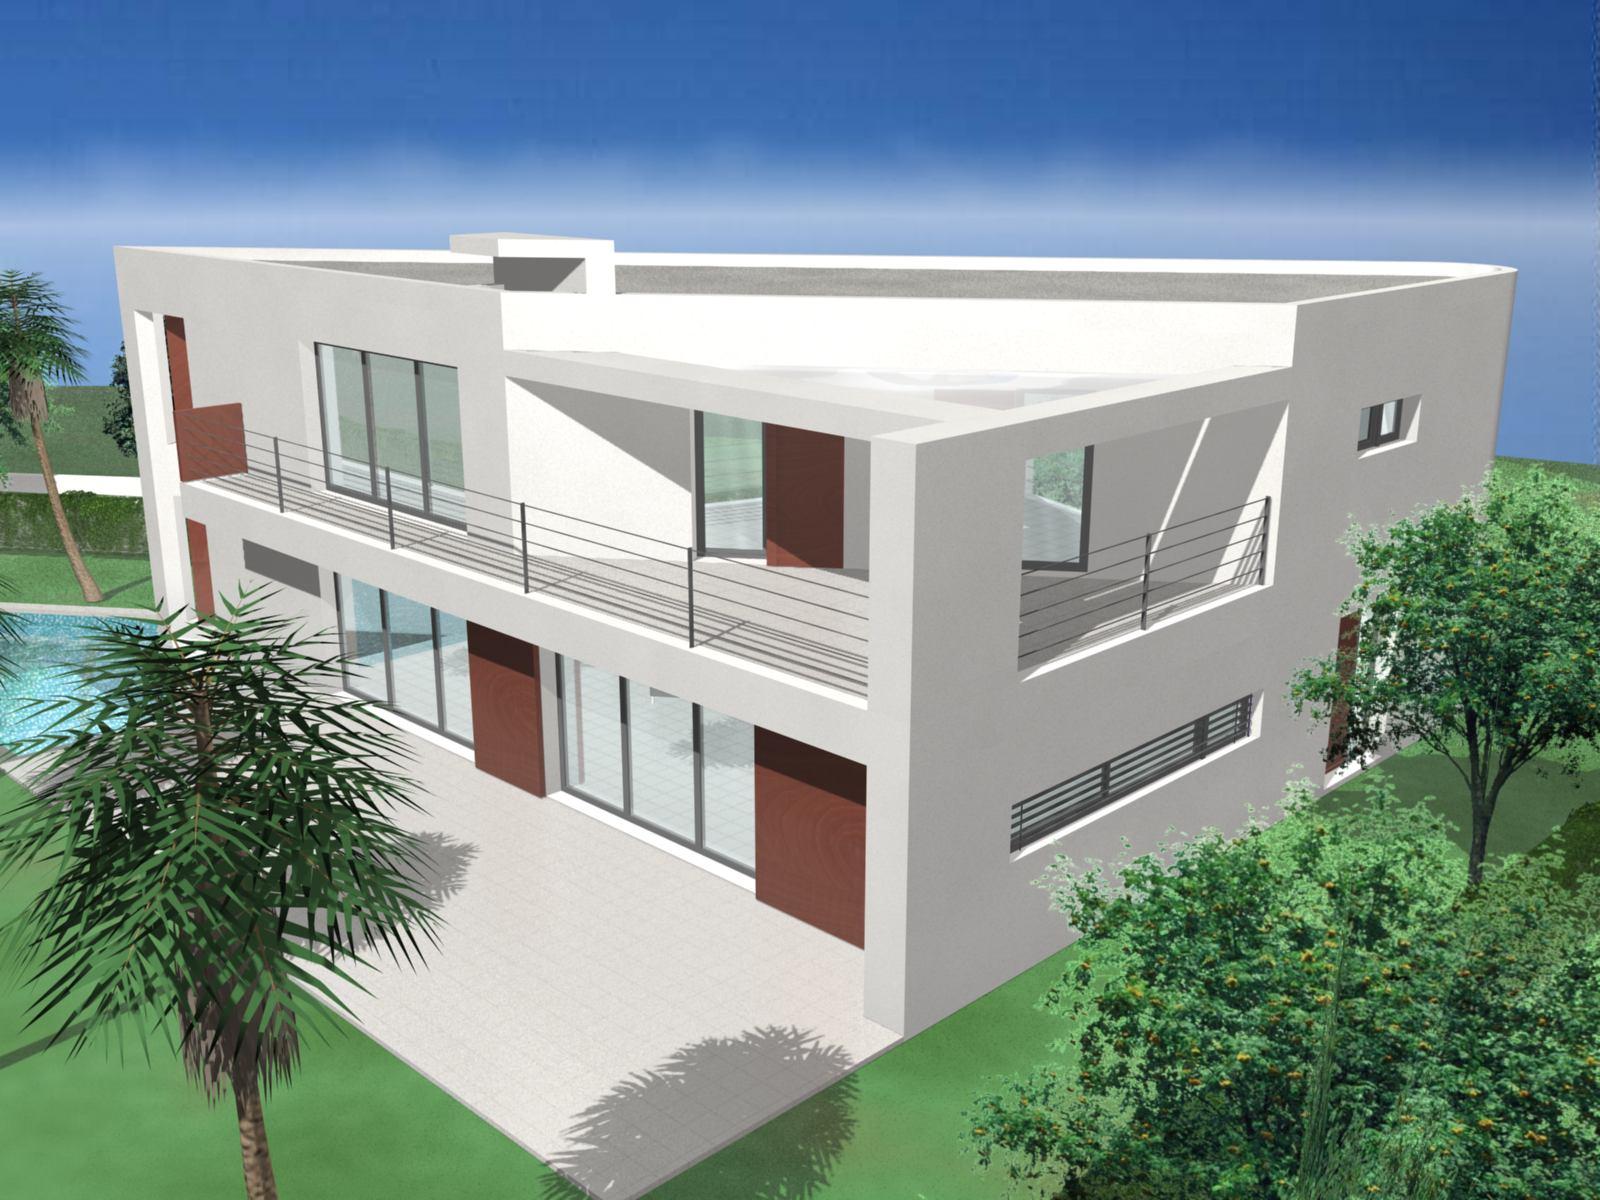 Notre maison moderne le projet for Projet maison moderne